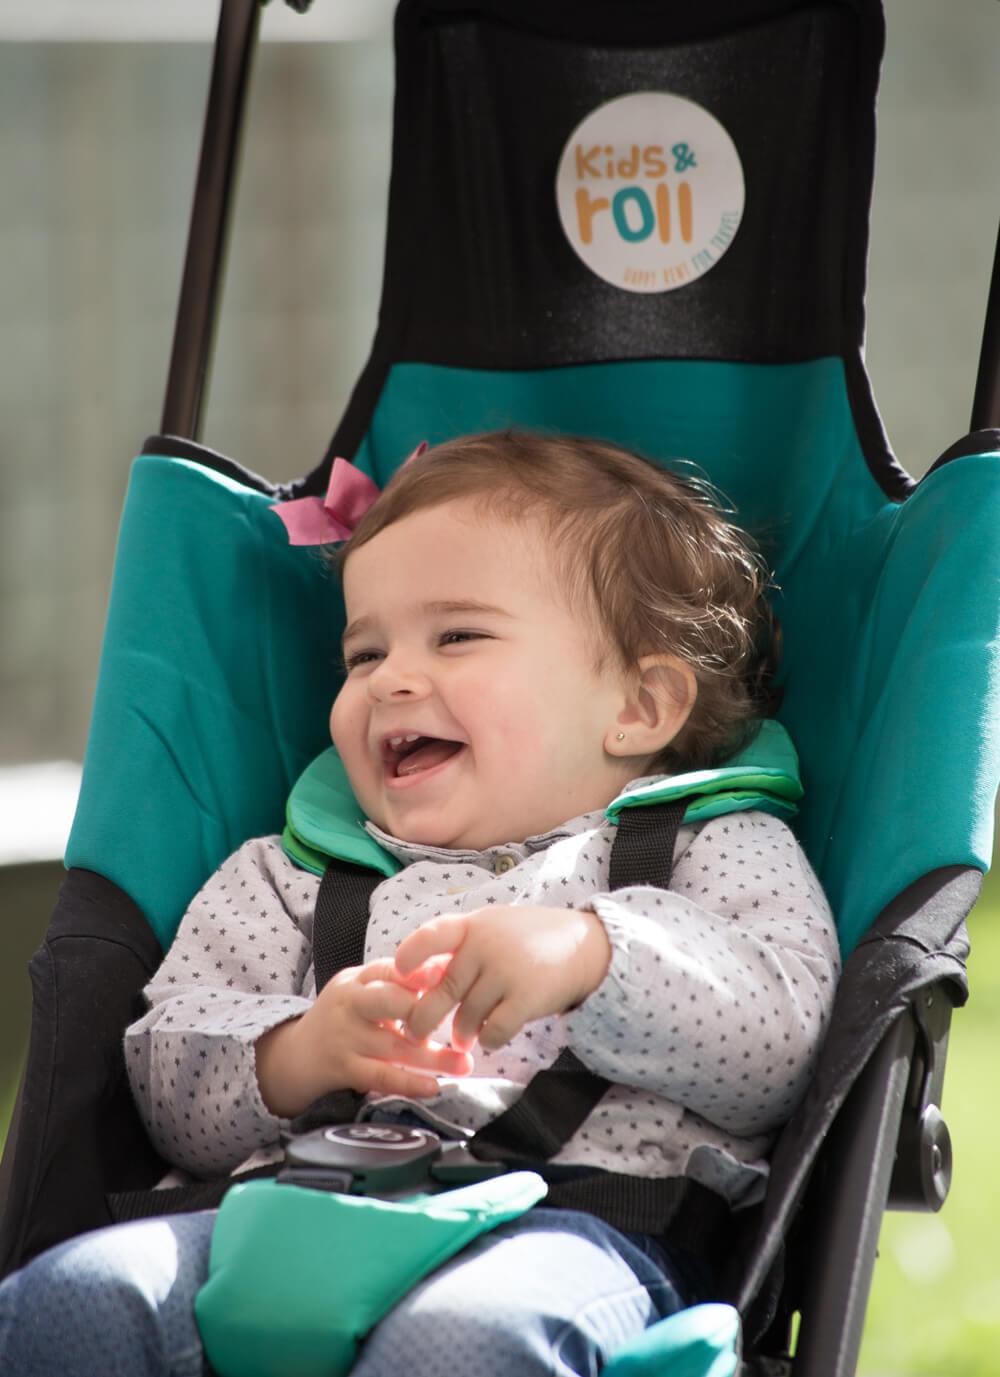 Kids and Roll alquiler de sillas de paseo